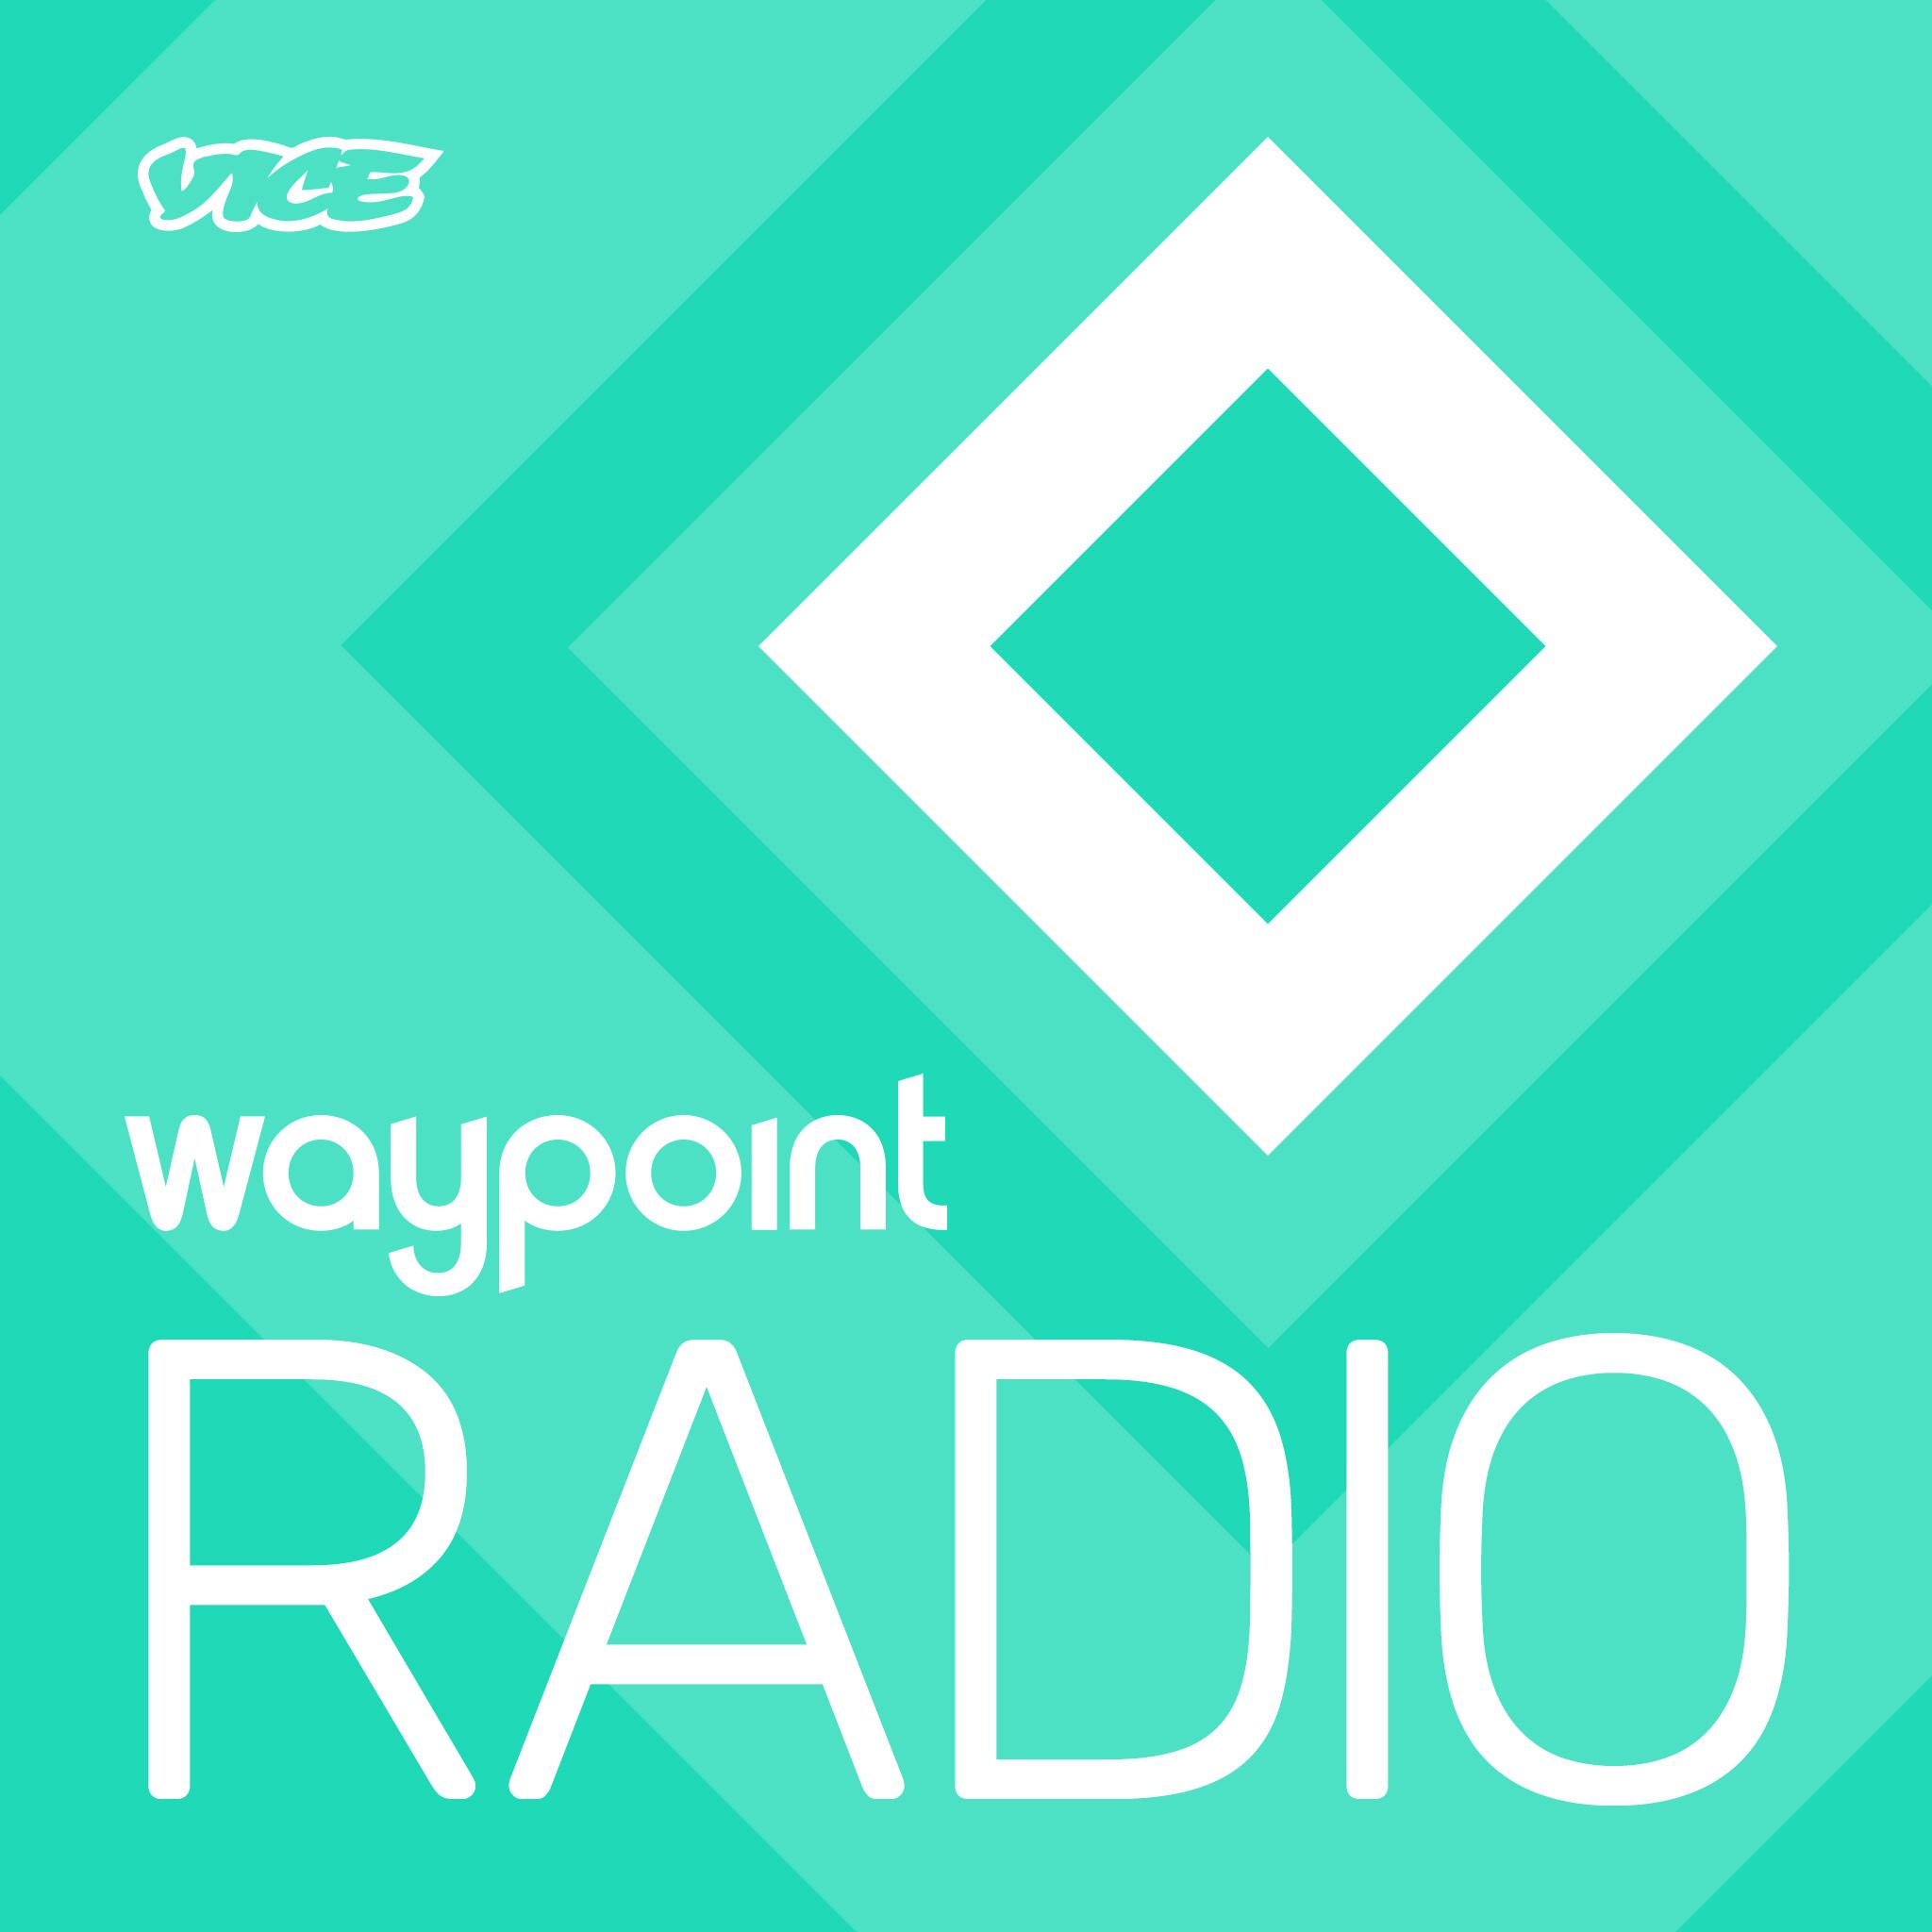 Waypoint Radio show art